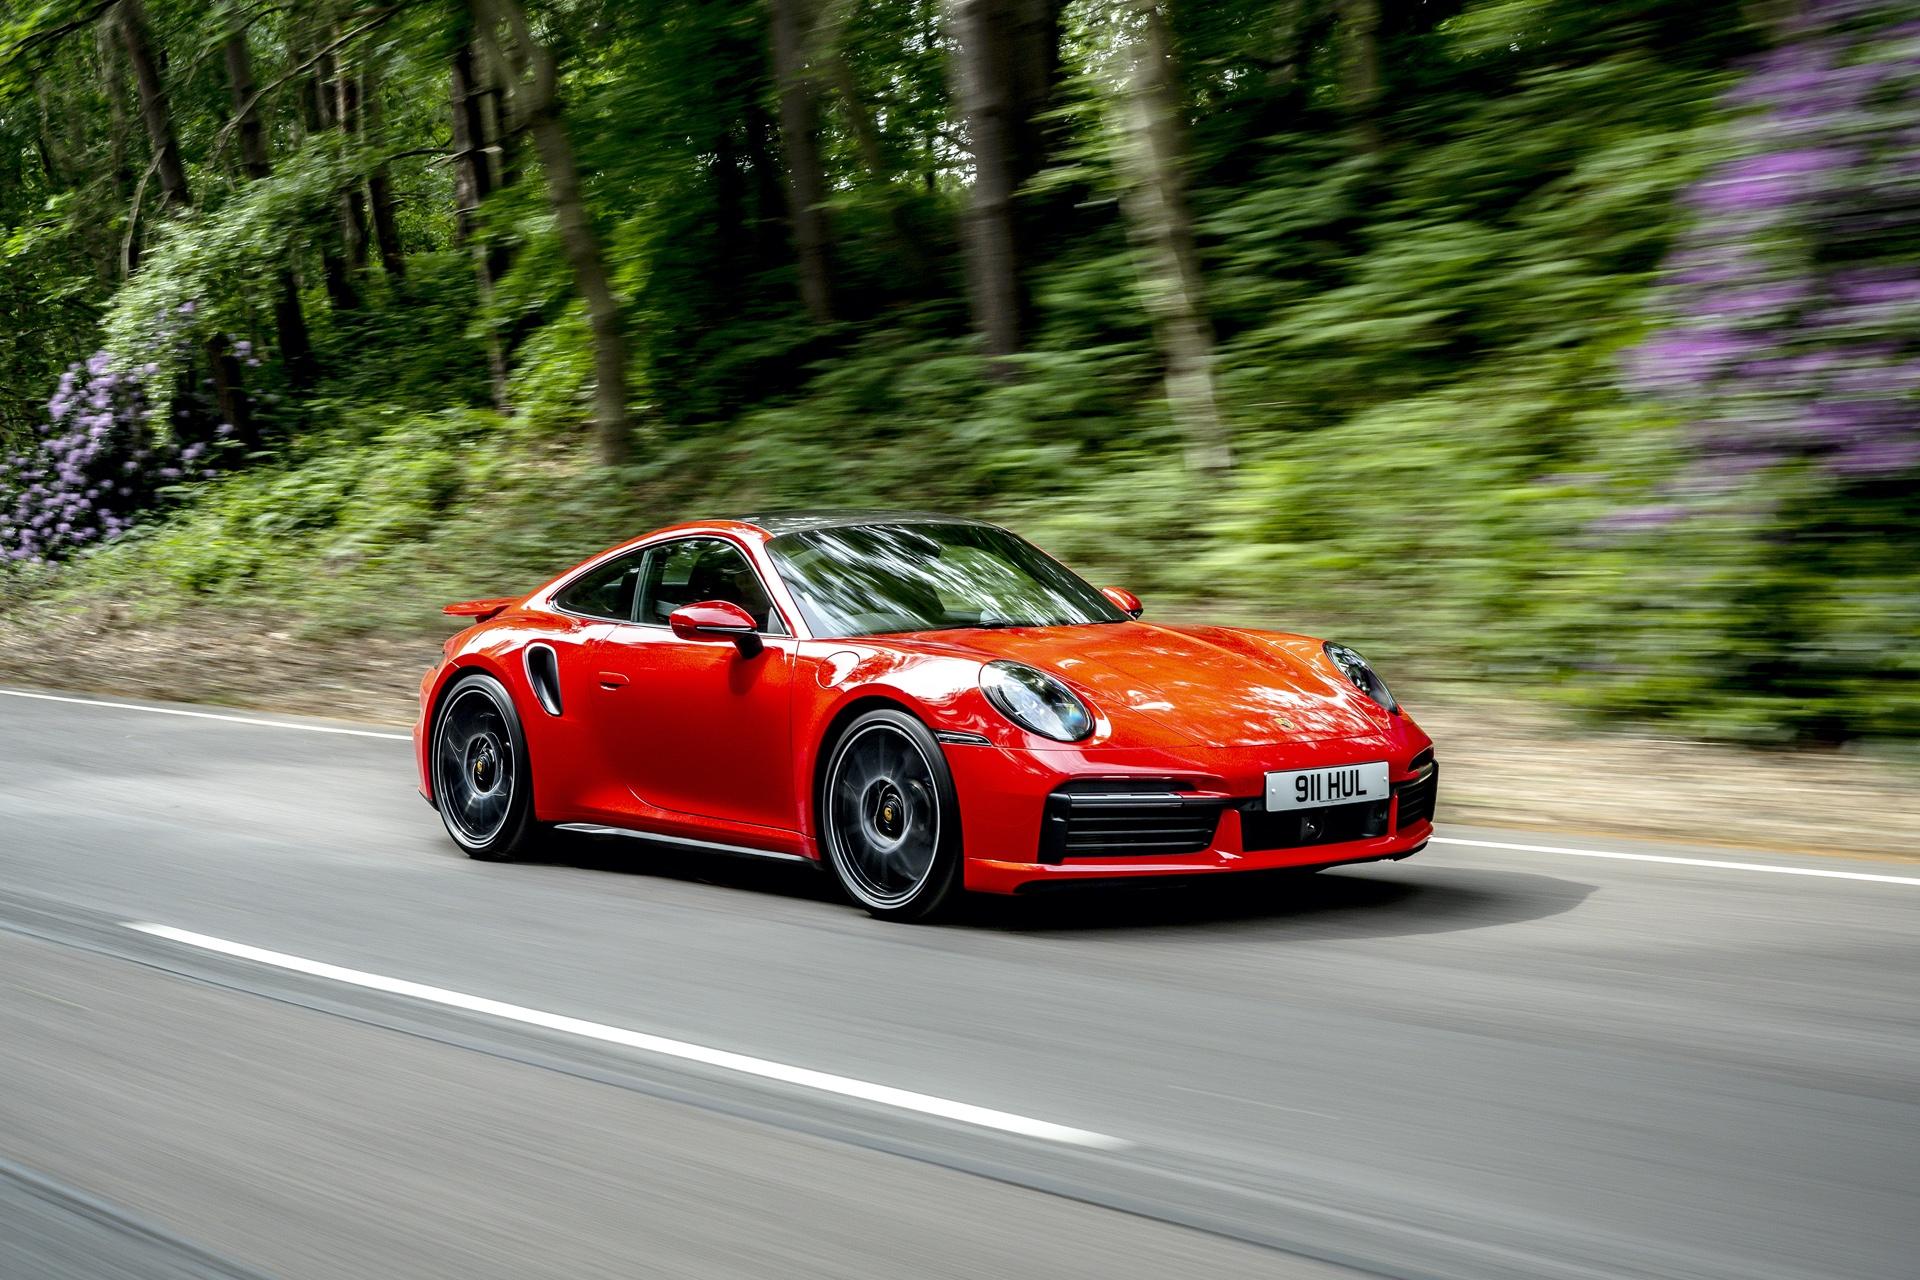 2020 992 Porsche 911 Turbo S Review